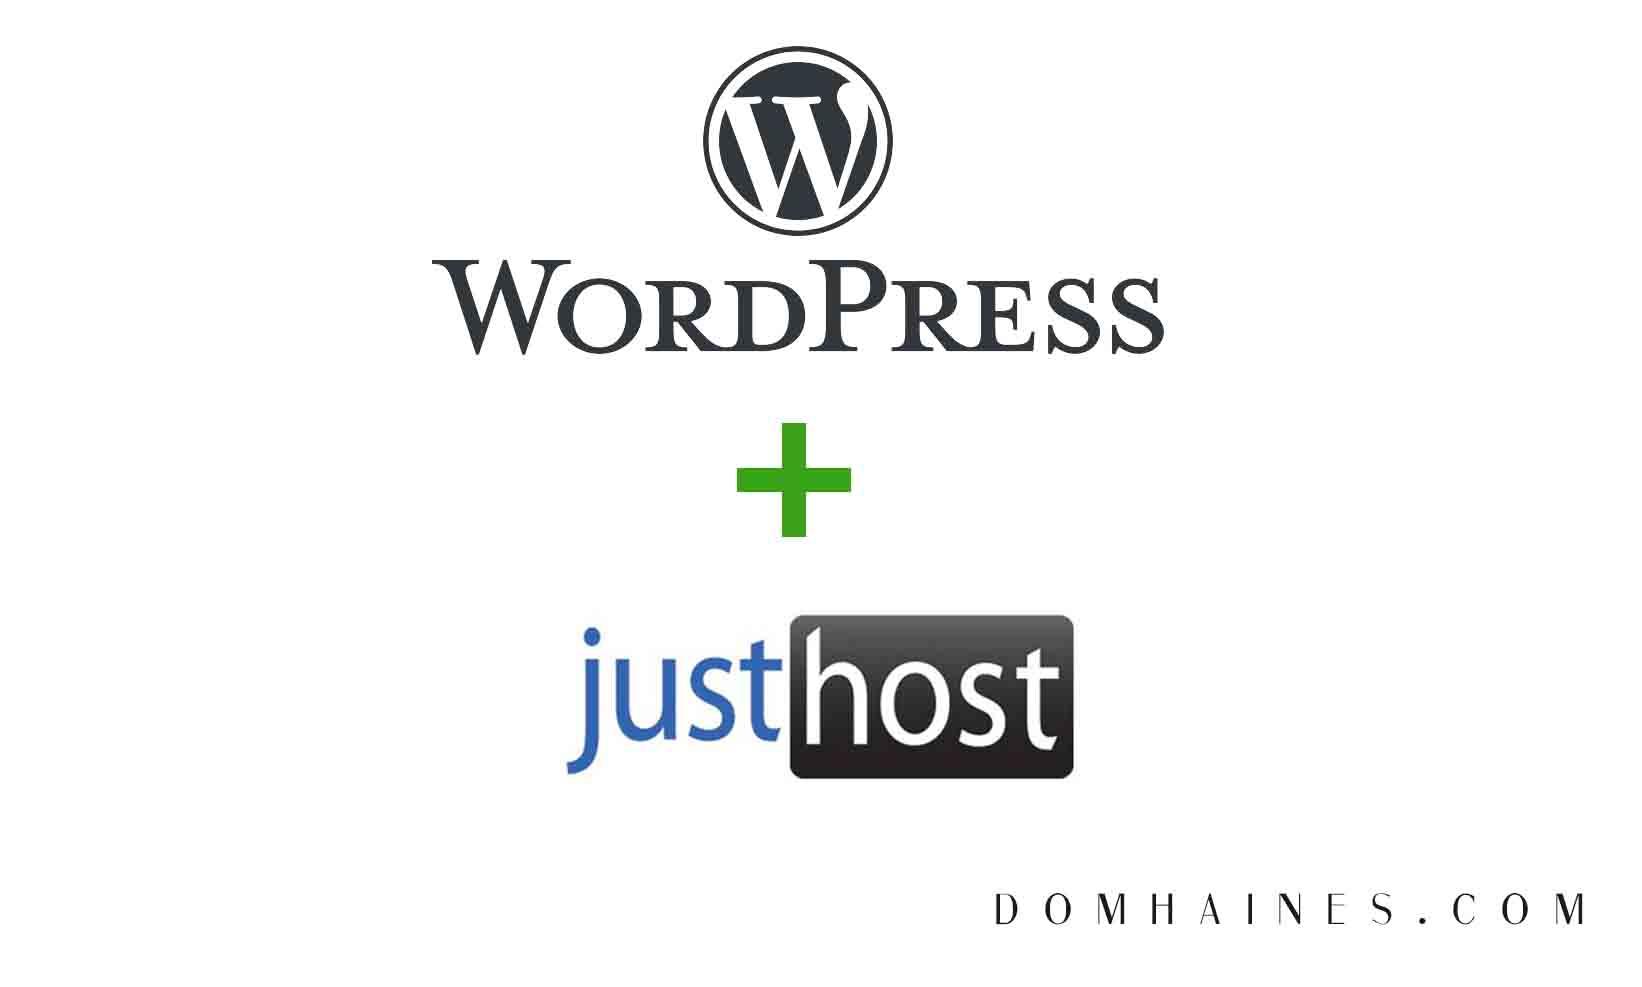 wordpress justhost